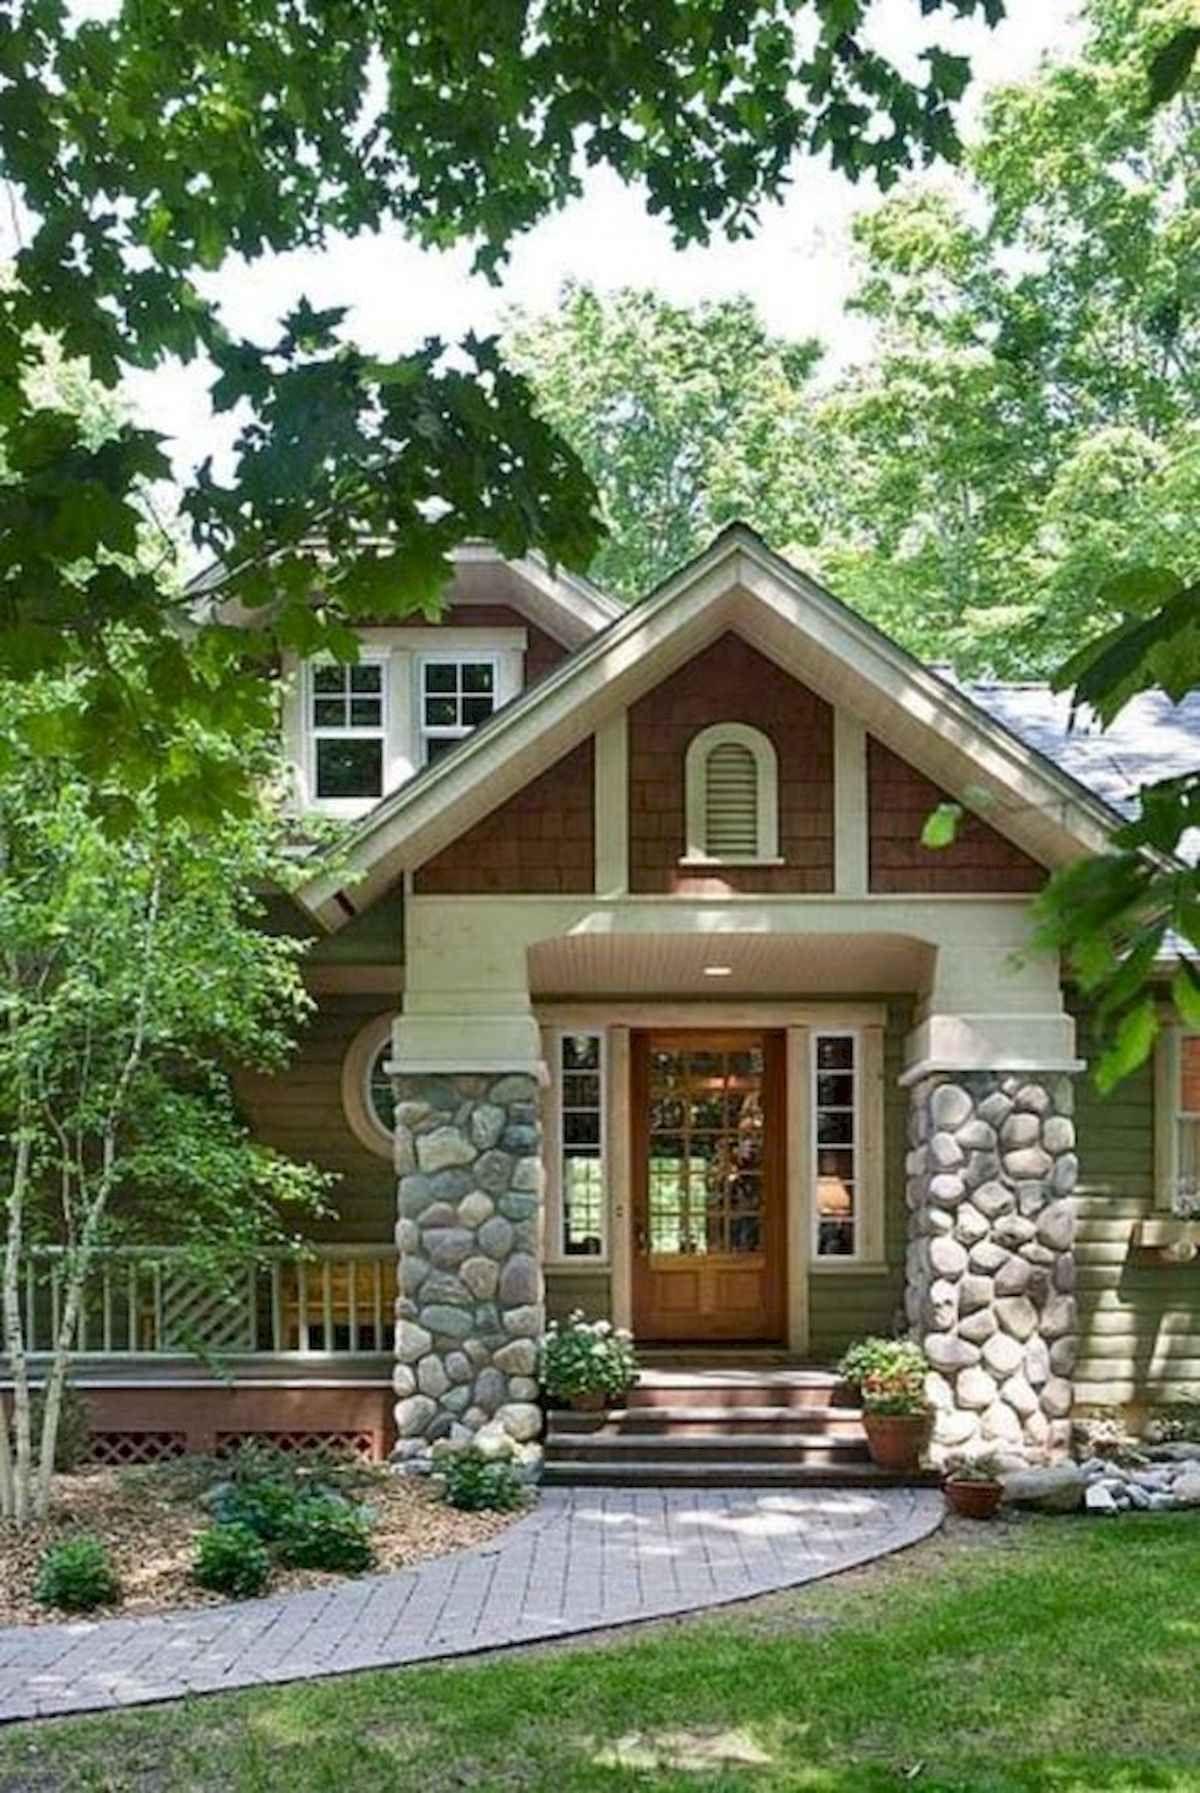 40 Amazing Craftsman Style Homes Design Ideas 23 Livingmarch Com Craftsmanstylehomes 40 Amazing C Craftsman Style Homes Craftsman Exterior Craftsman House